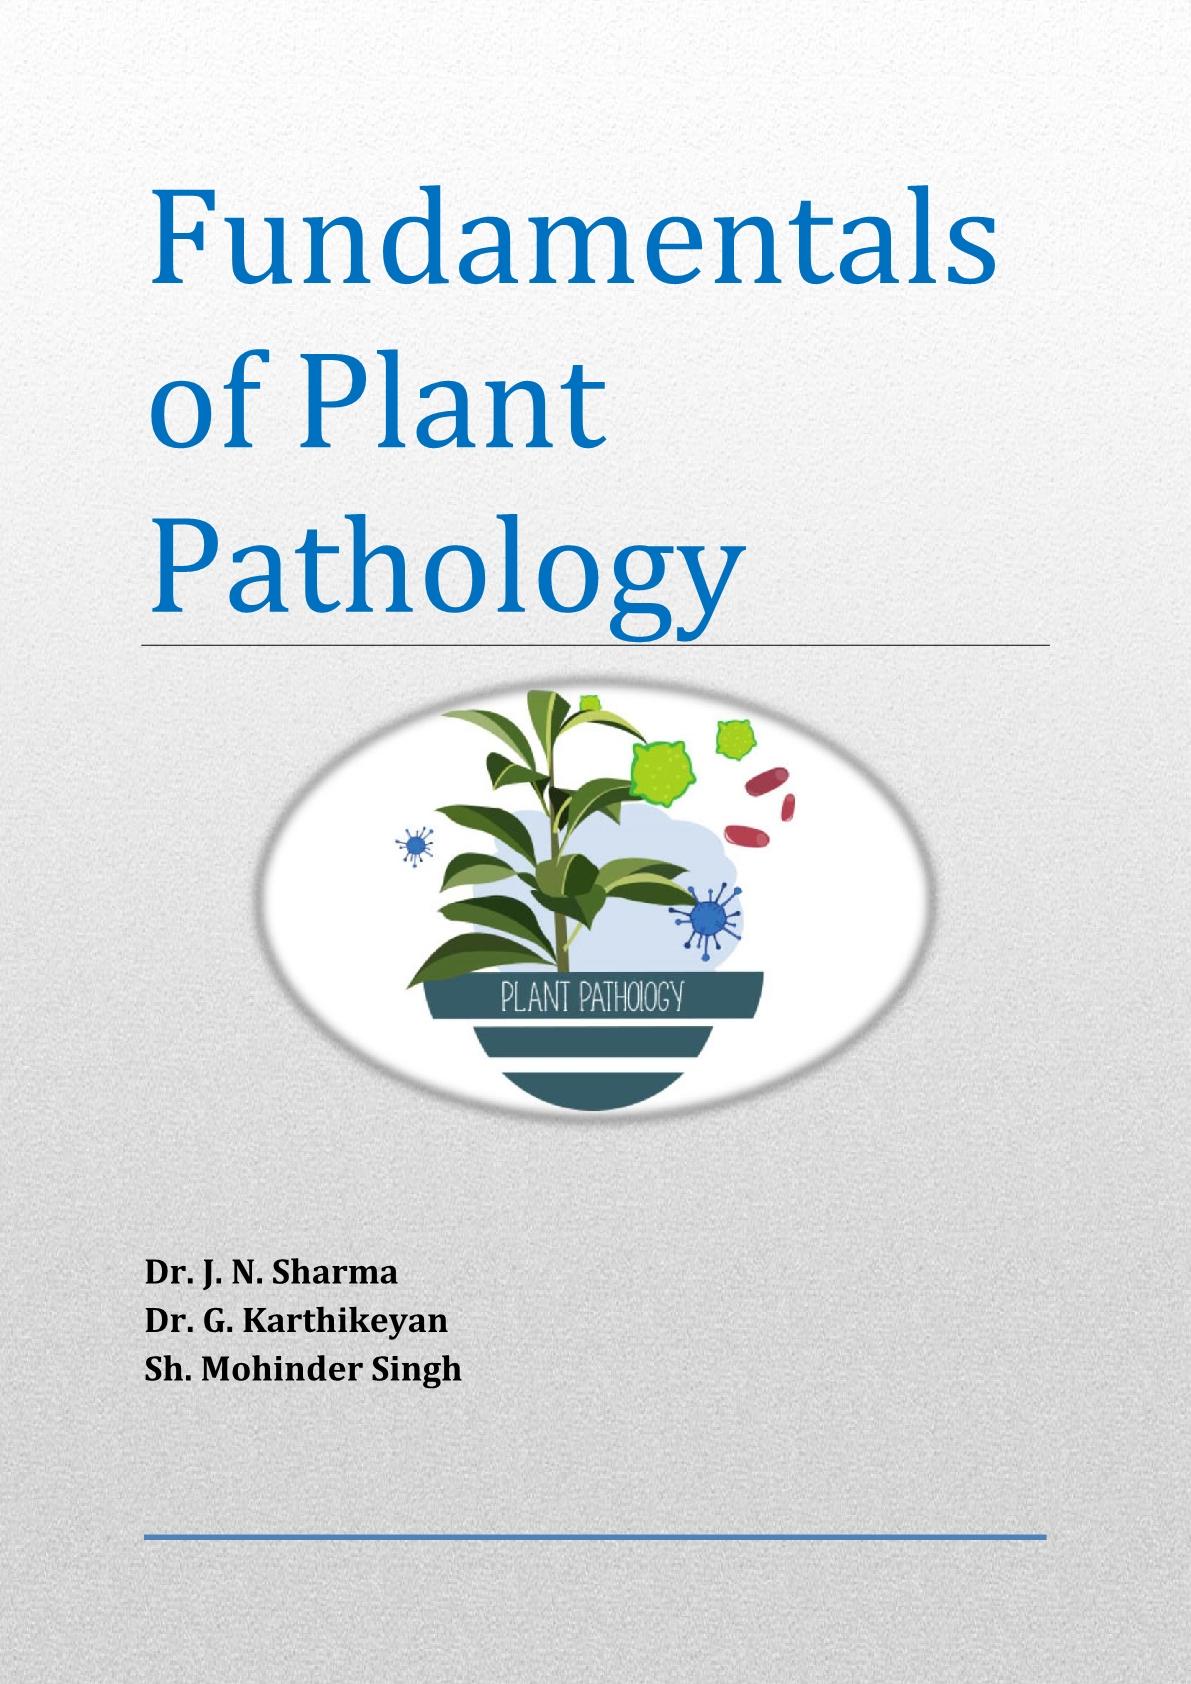 Fundamental of Plant Pathology - ICAR eCourse PDF Book -